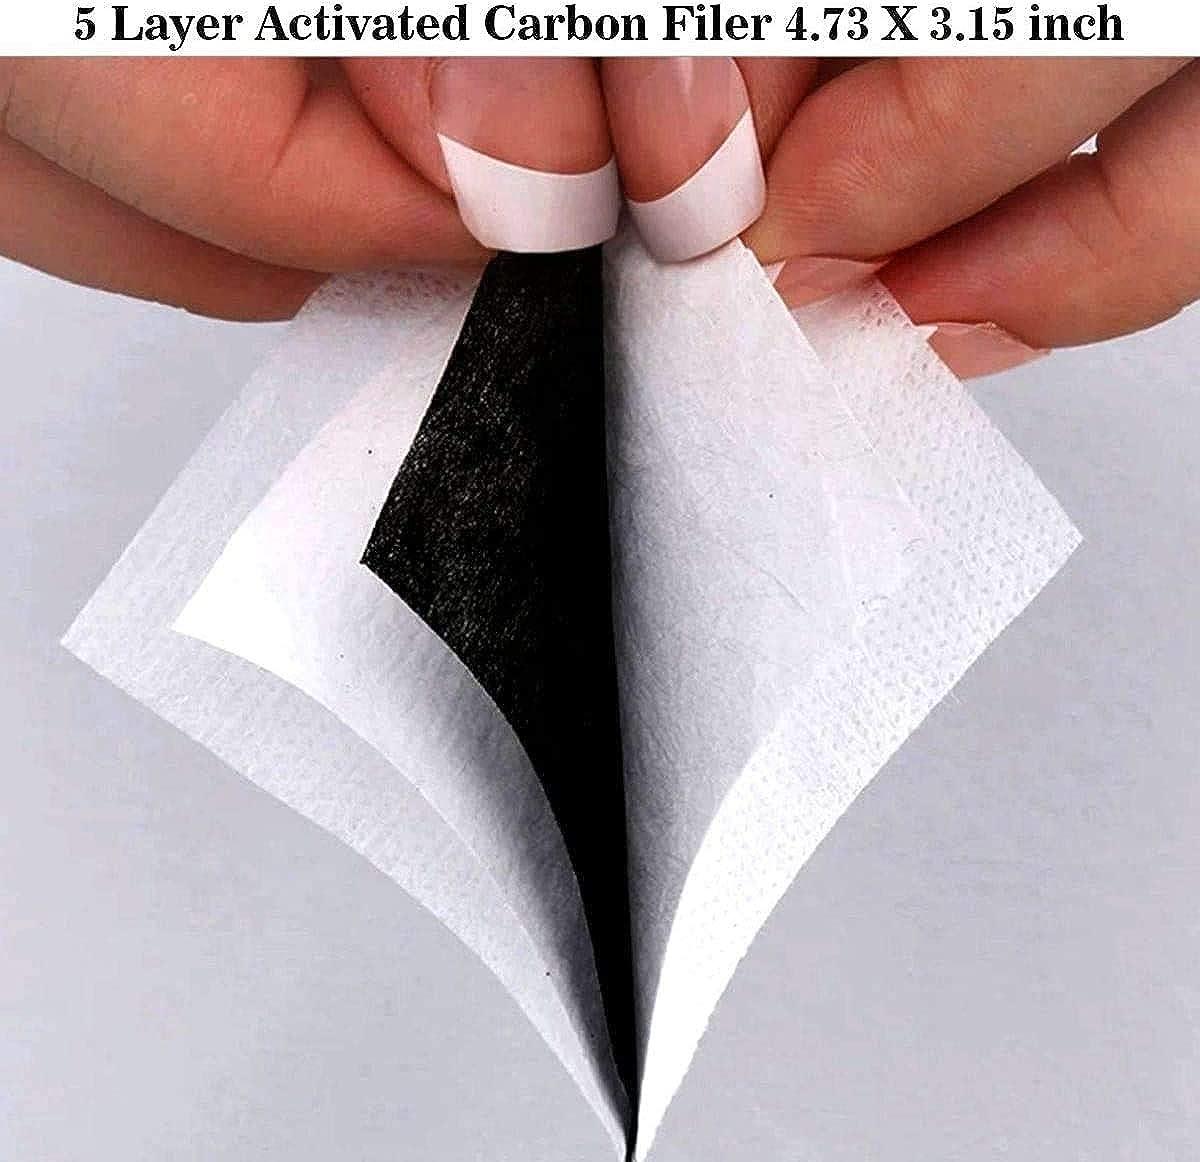 Star Heaven Macthomas Clan Tartan Men Women Adjustable Ear Loops Face Balaclava Anti Pollution Washable with 2 Filters